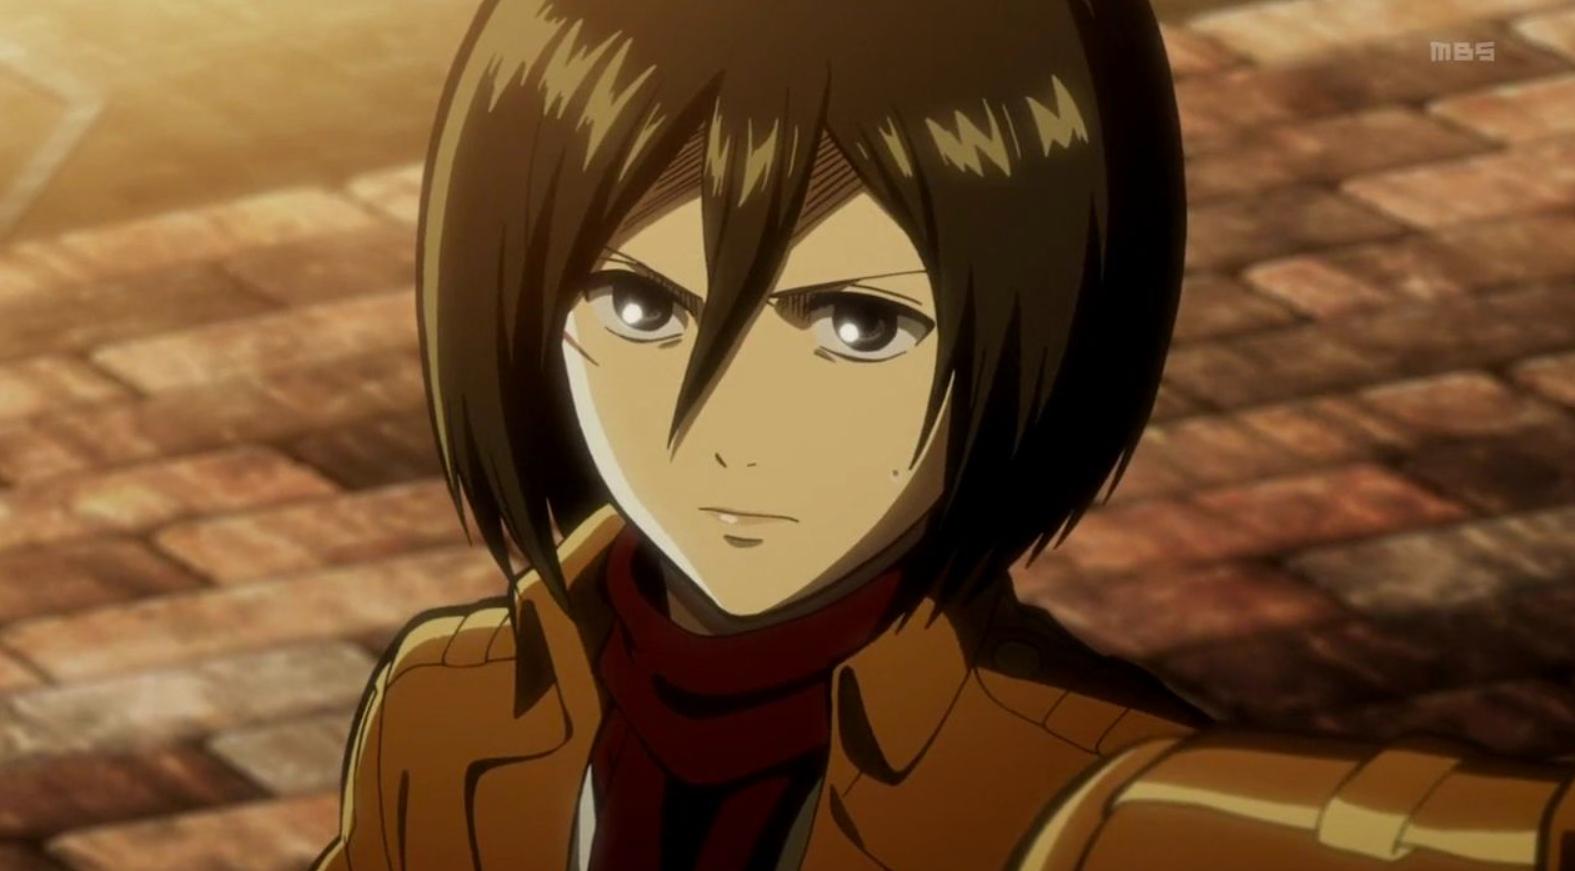 Mikasa Ackerman in Attack on Titan